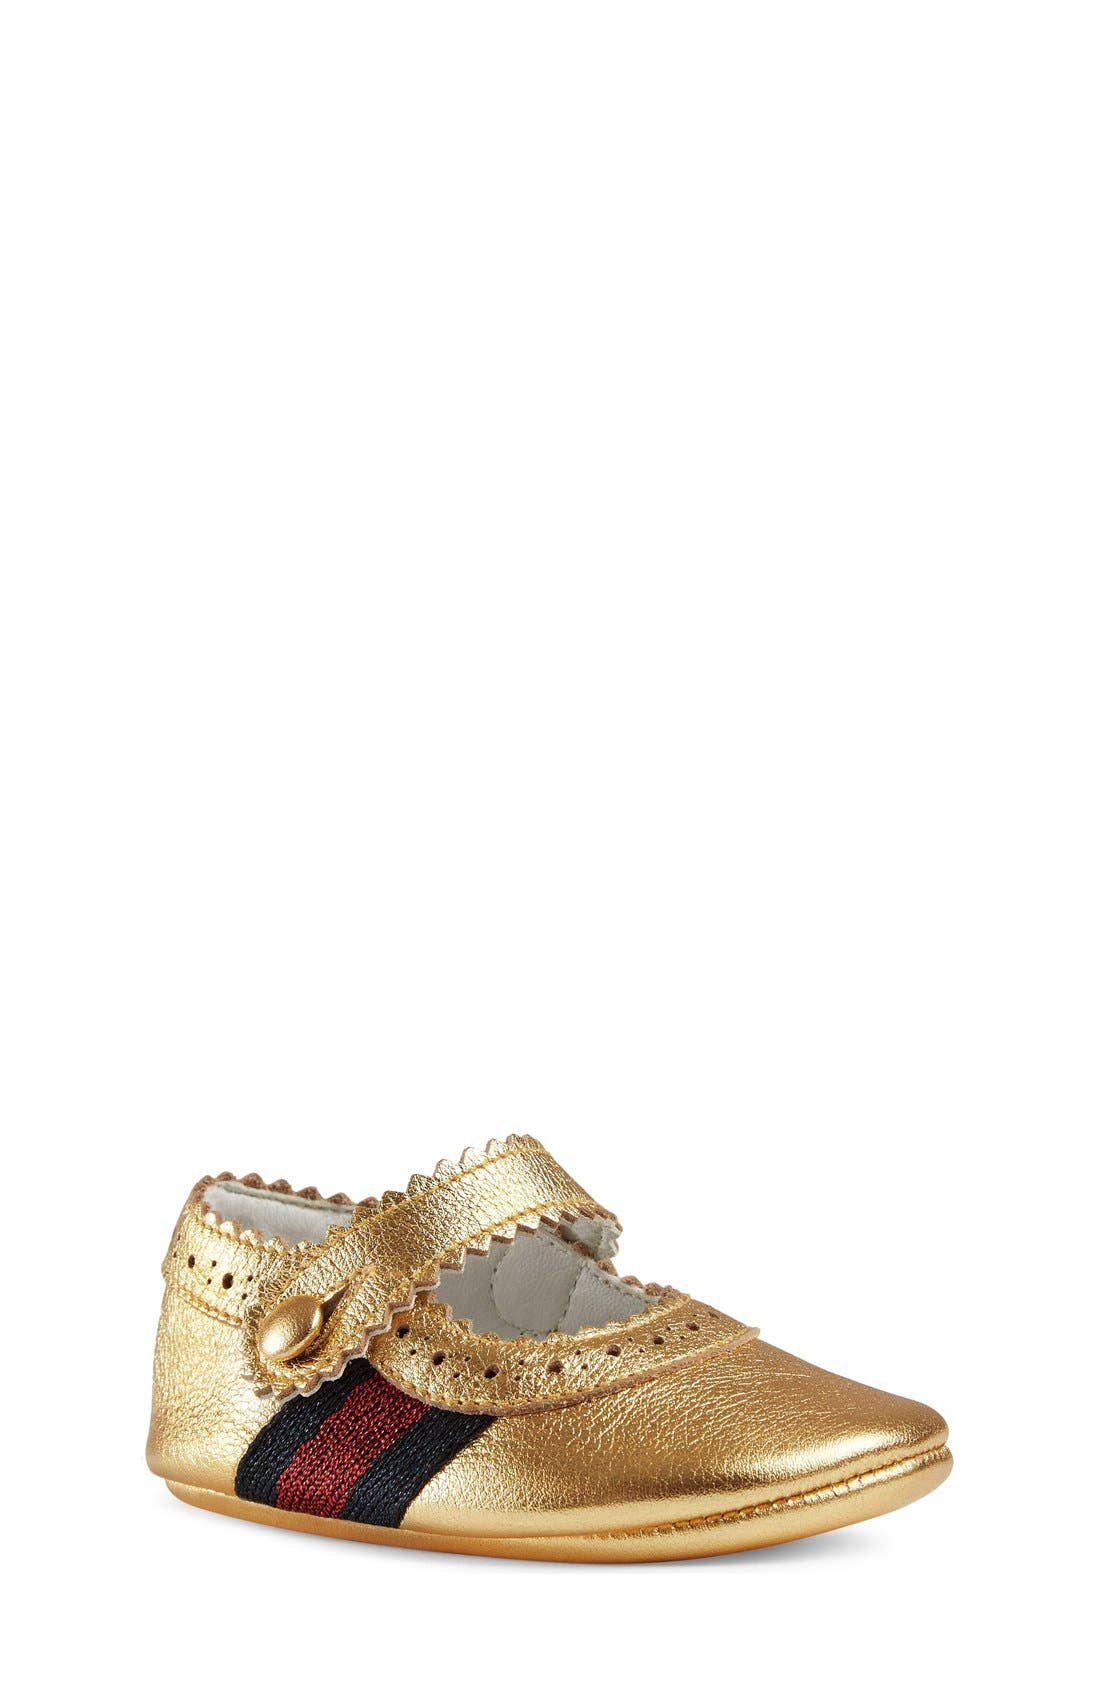 Gucci Lila Mary Jane Crib Shoe Baby